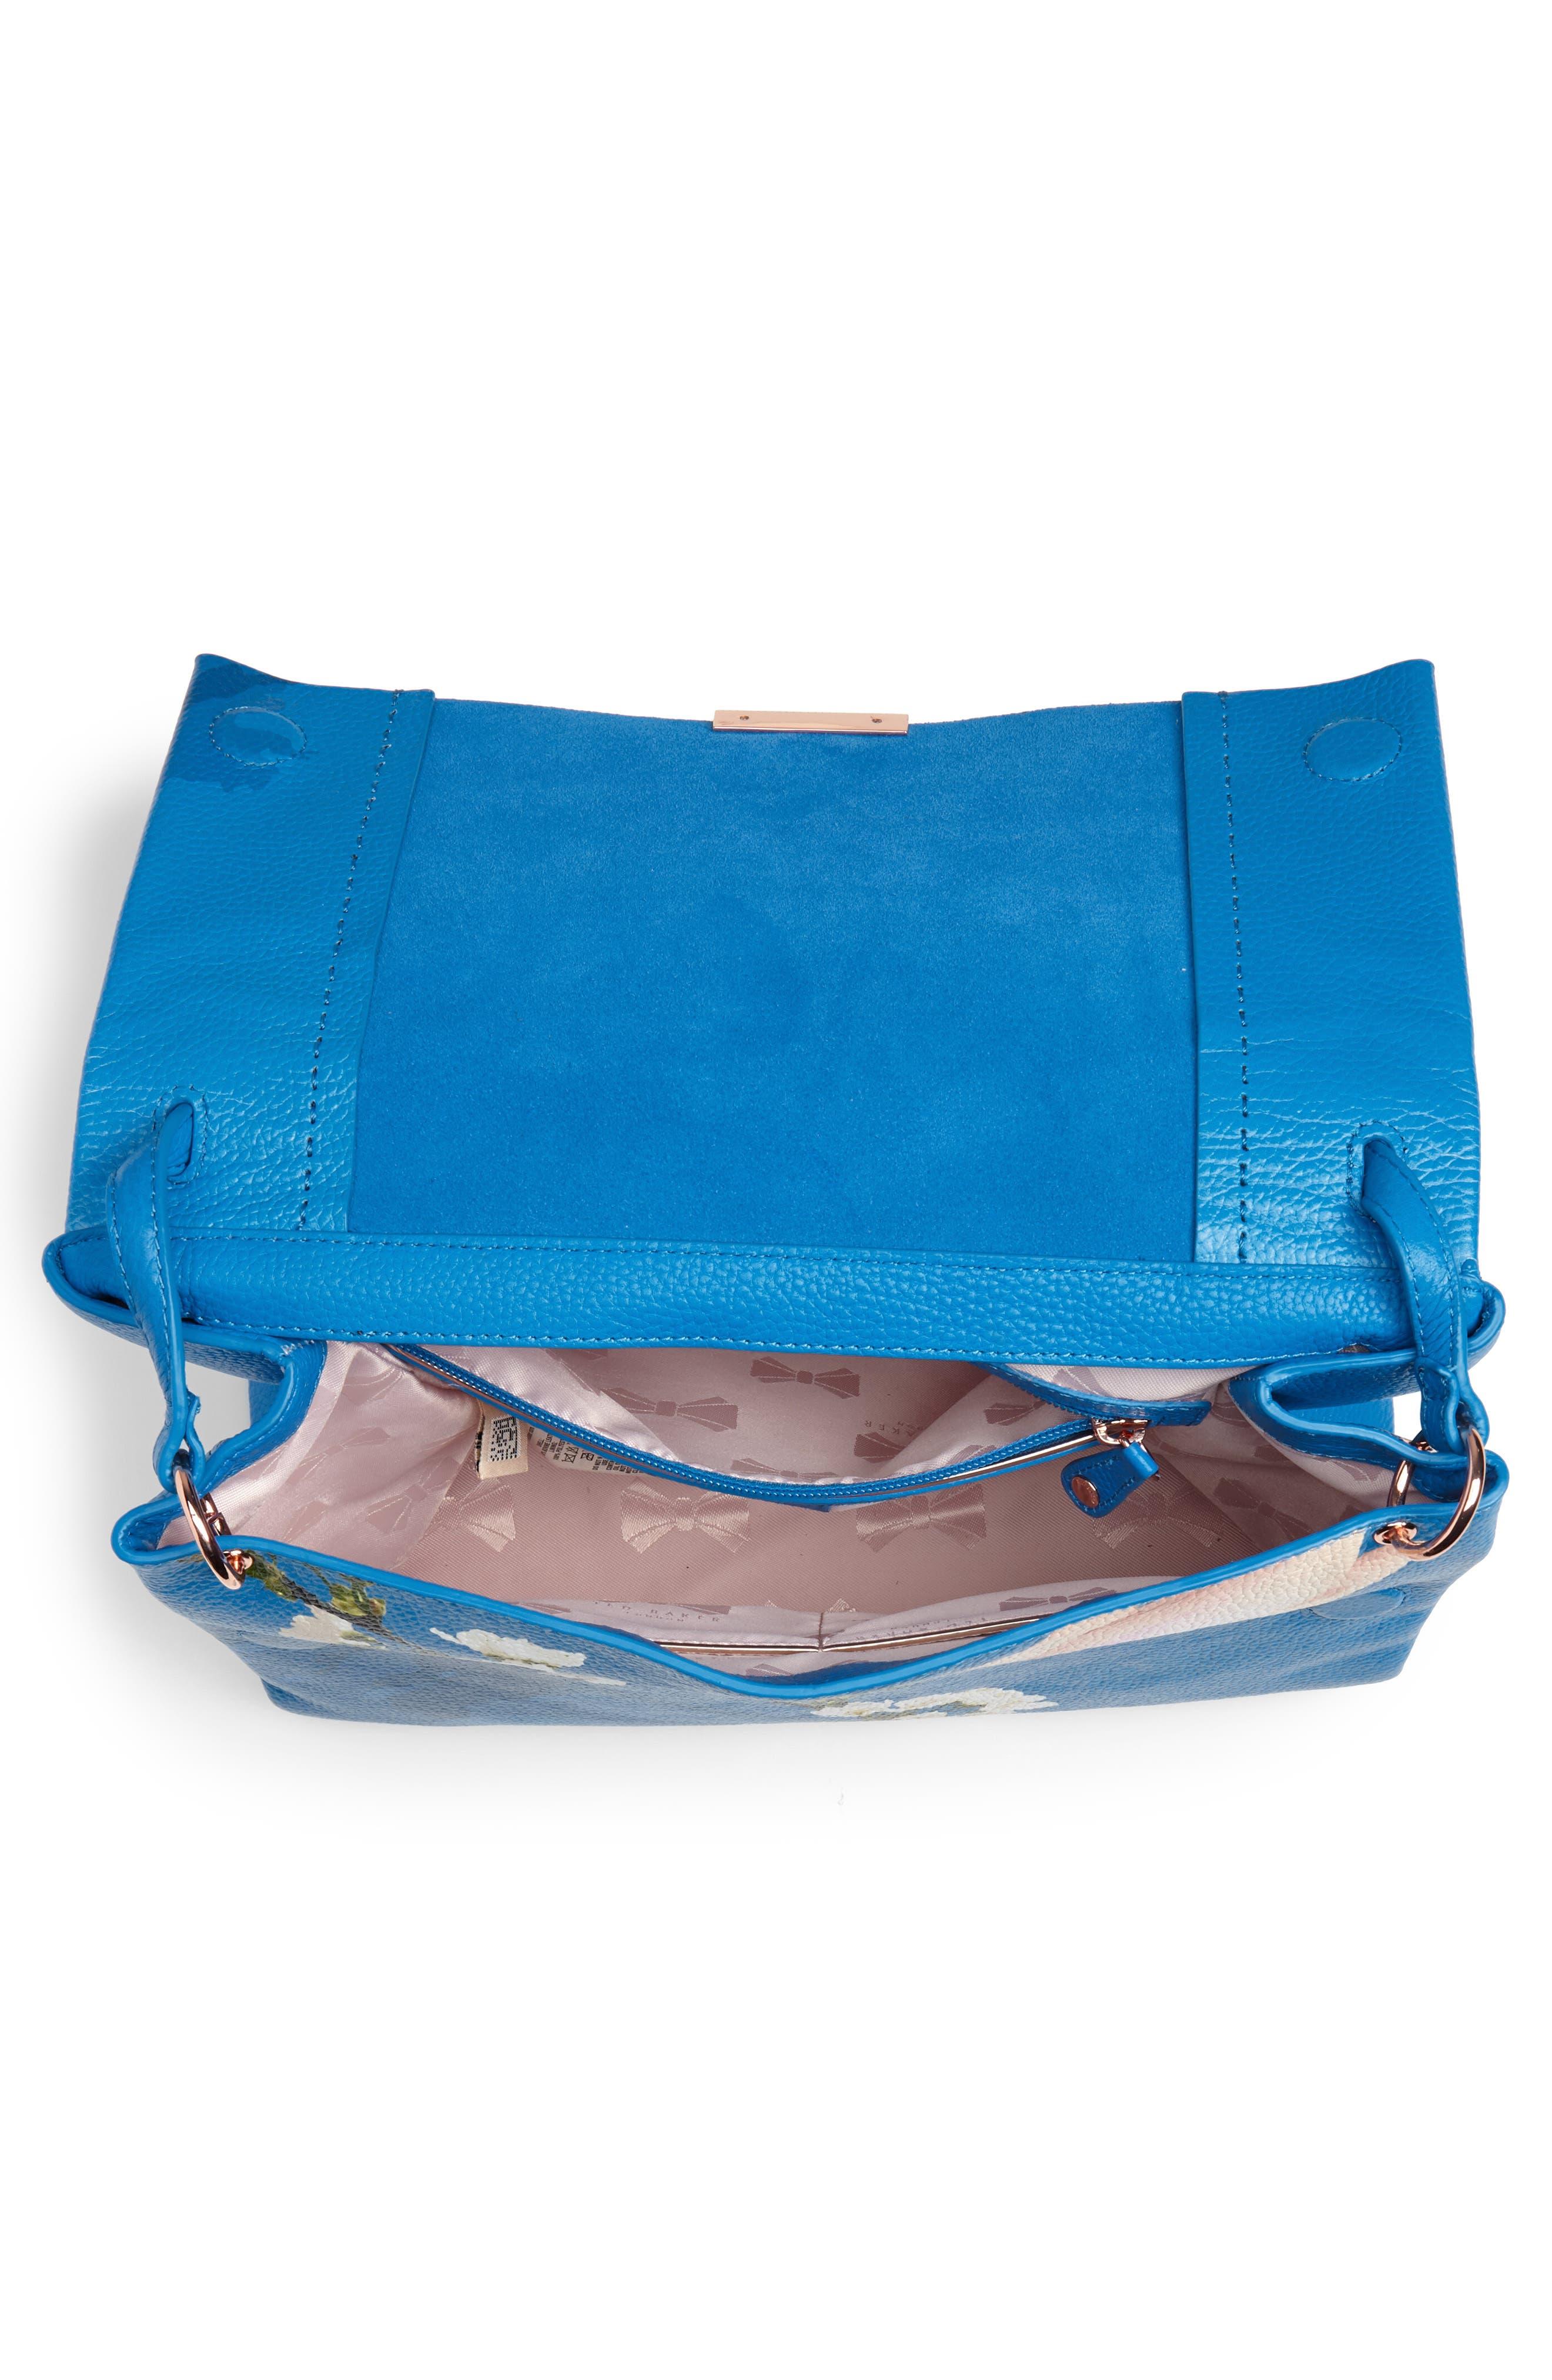 Heeidi Harmony Print Leather Shoulder Bag,                             Alternate thumbnail 4, color,                             430